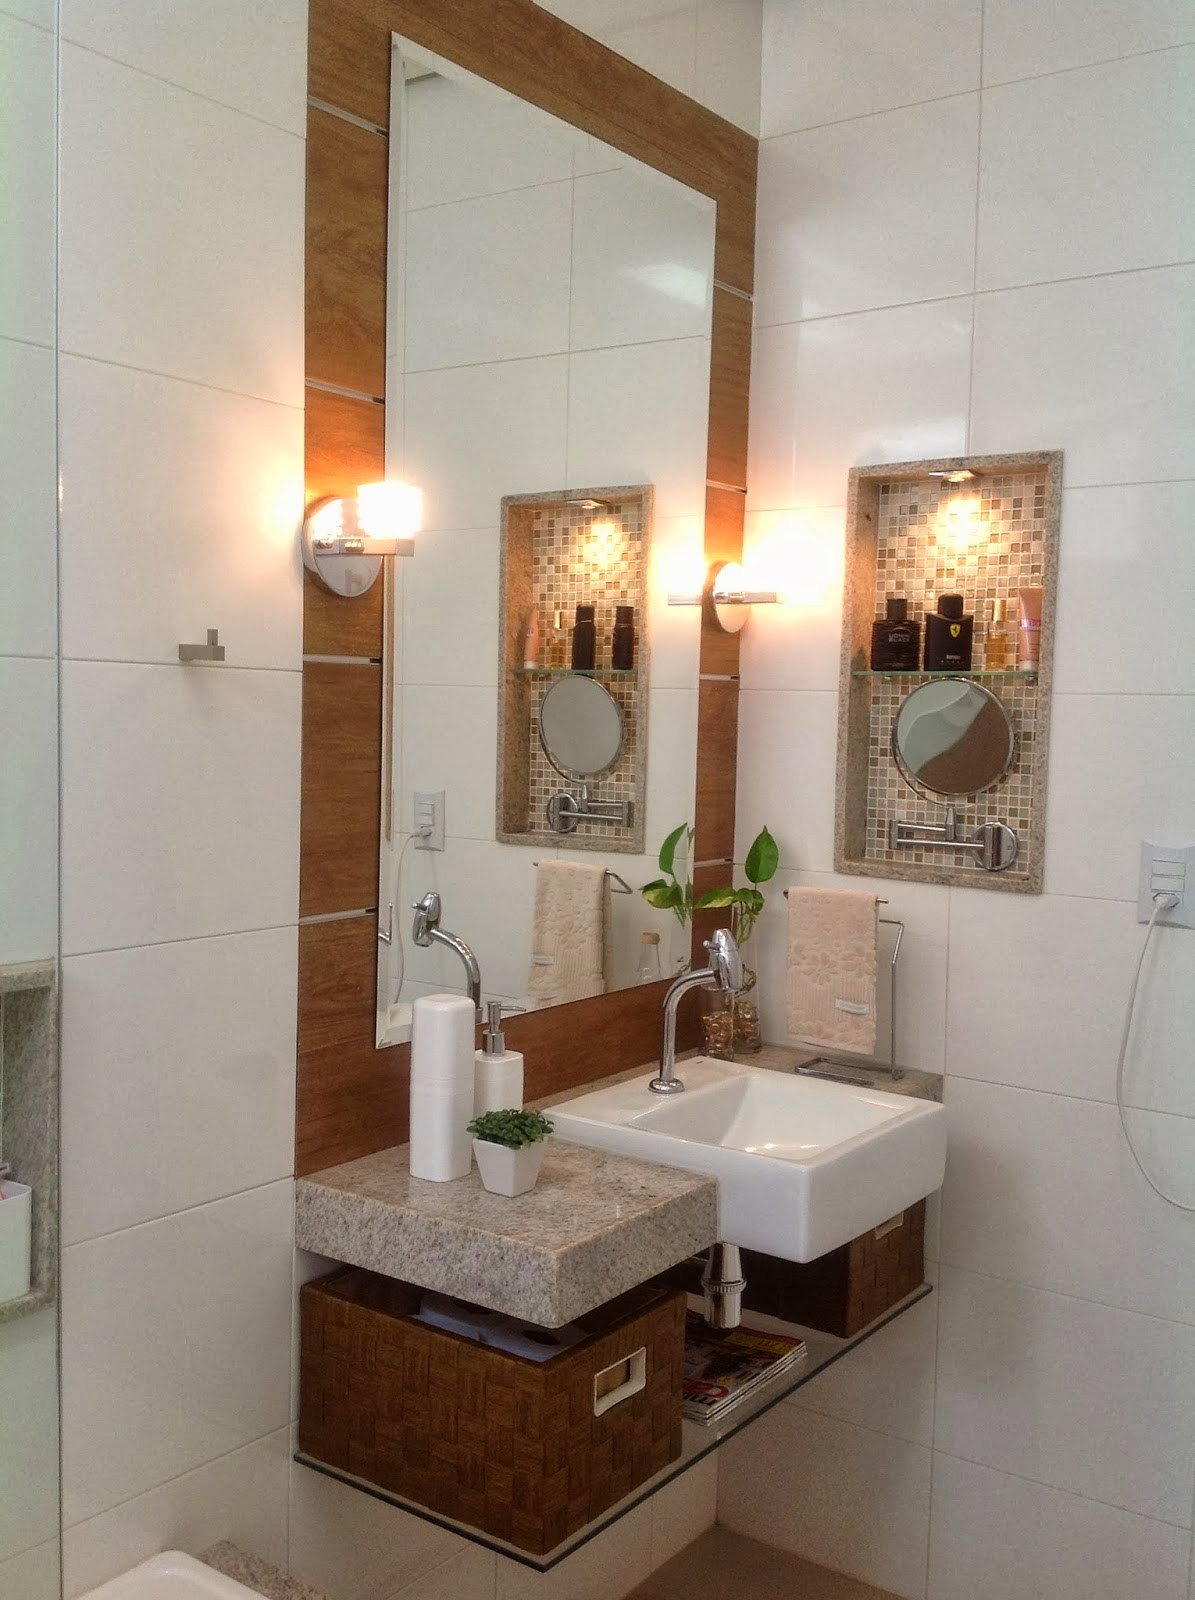 Meu Palácio de 64m²: Cuba semi encaixe Ocean Pacific Incepa #A25829 1195x1600 Banheiro Acessivel Medidas Minimas